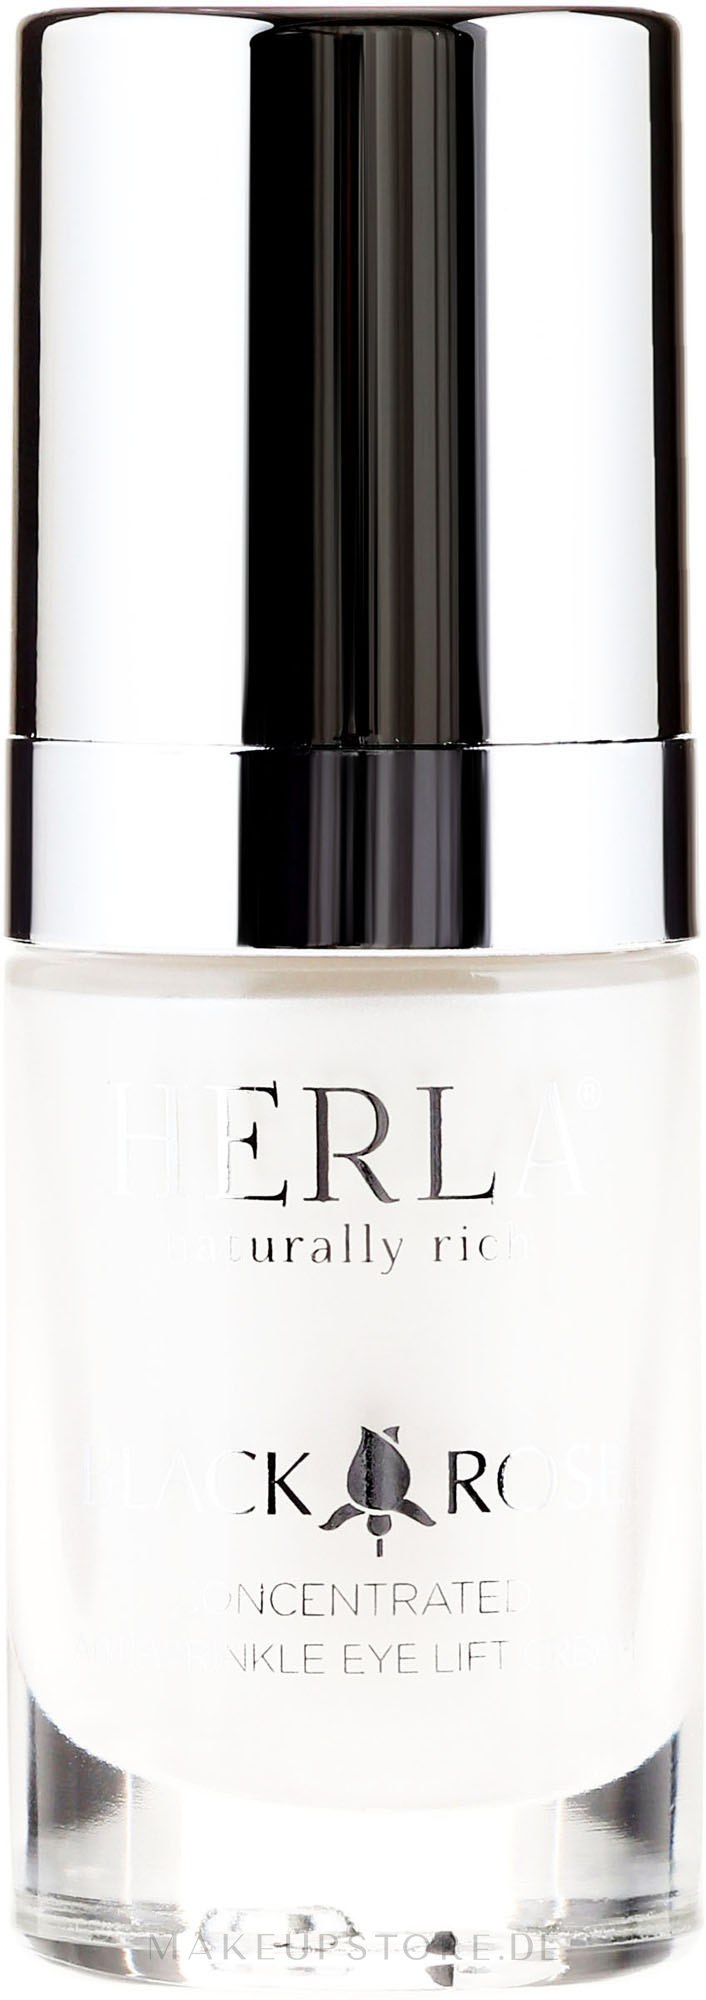 Konzentrierte Anti-Falten Augencreme - Herla Black Rose Concentrated Anti-Wrinkle Eye Lift Cream — Bild 15 ml